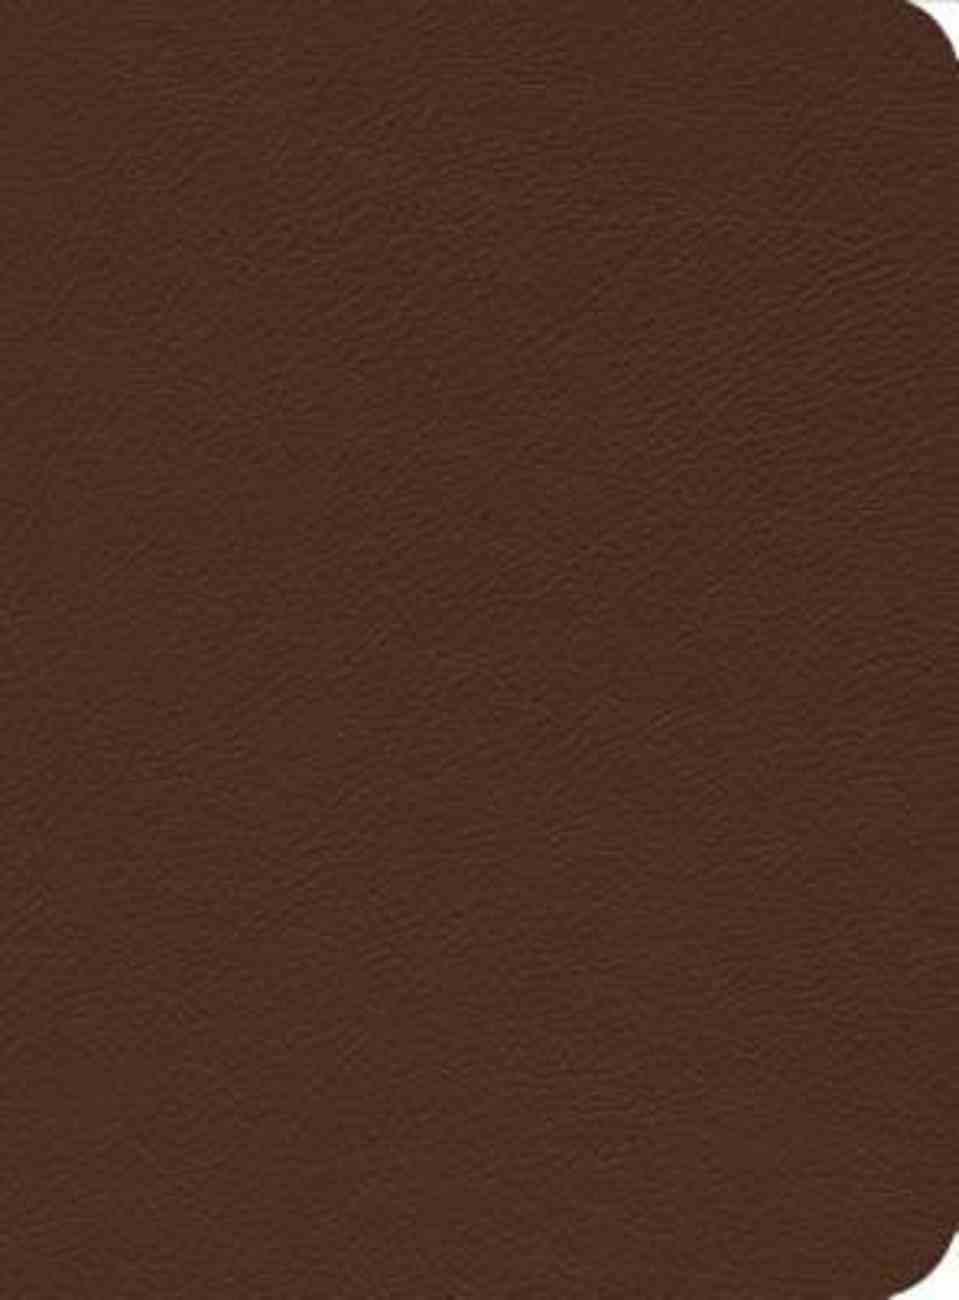 ESV Reformation Study Bible Brown Genuine Leather